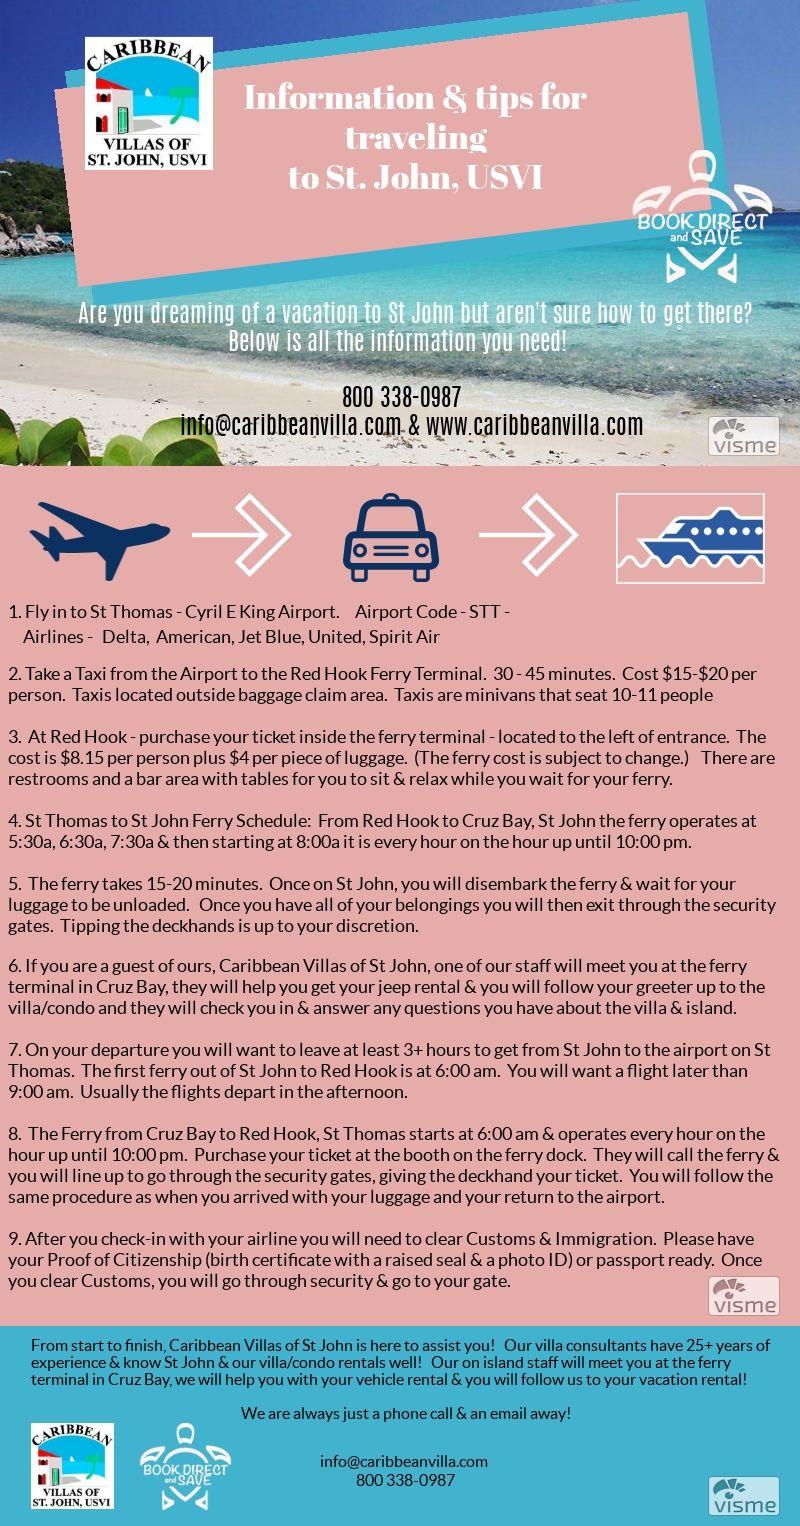 St John Travel Tips www caribbeanvilla com 800 338-0987